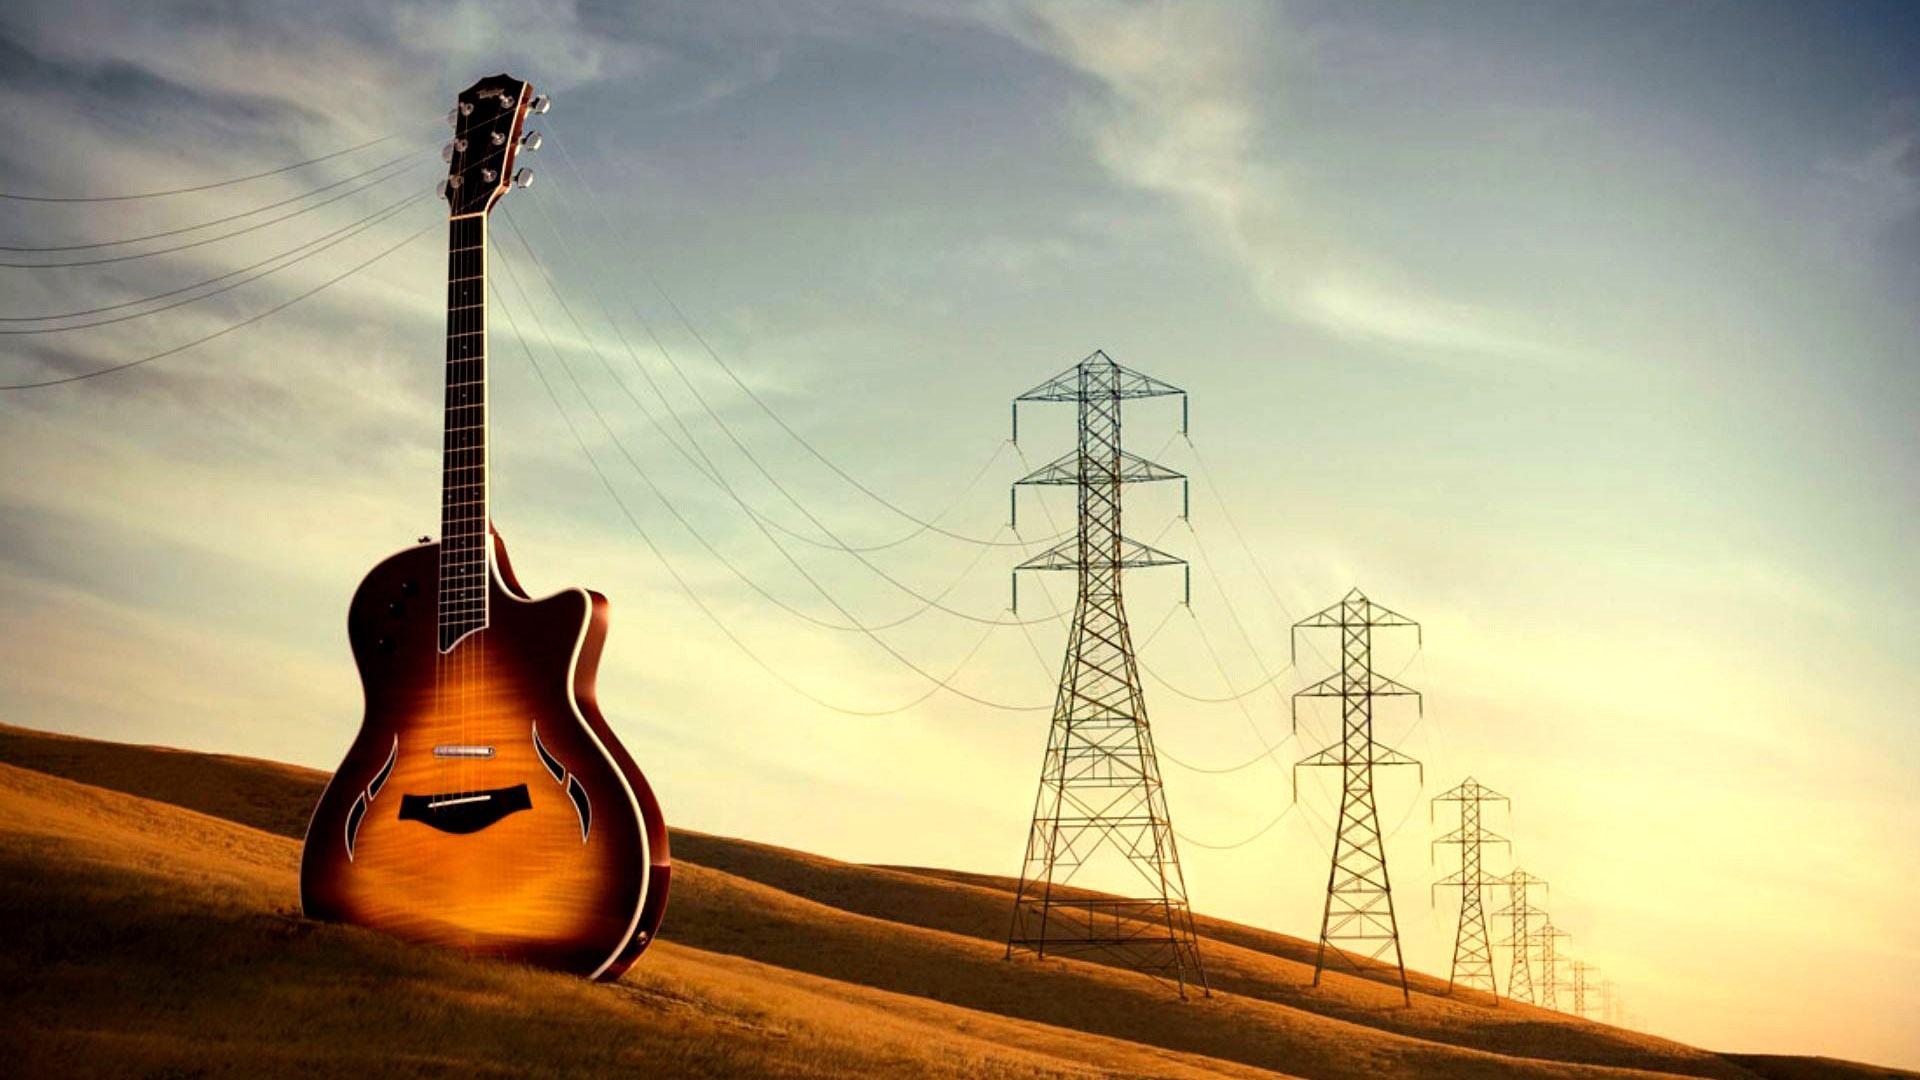 guitar full collor hd - photo #1